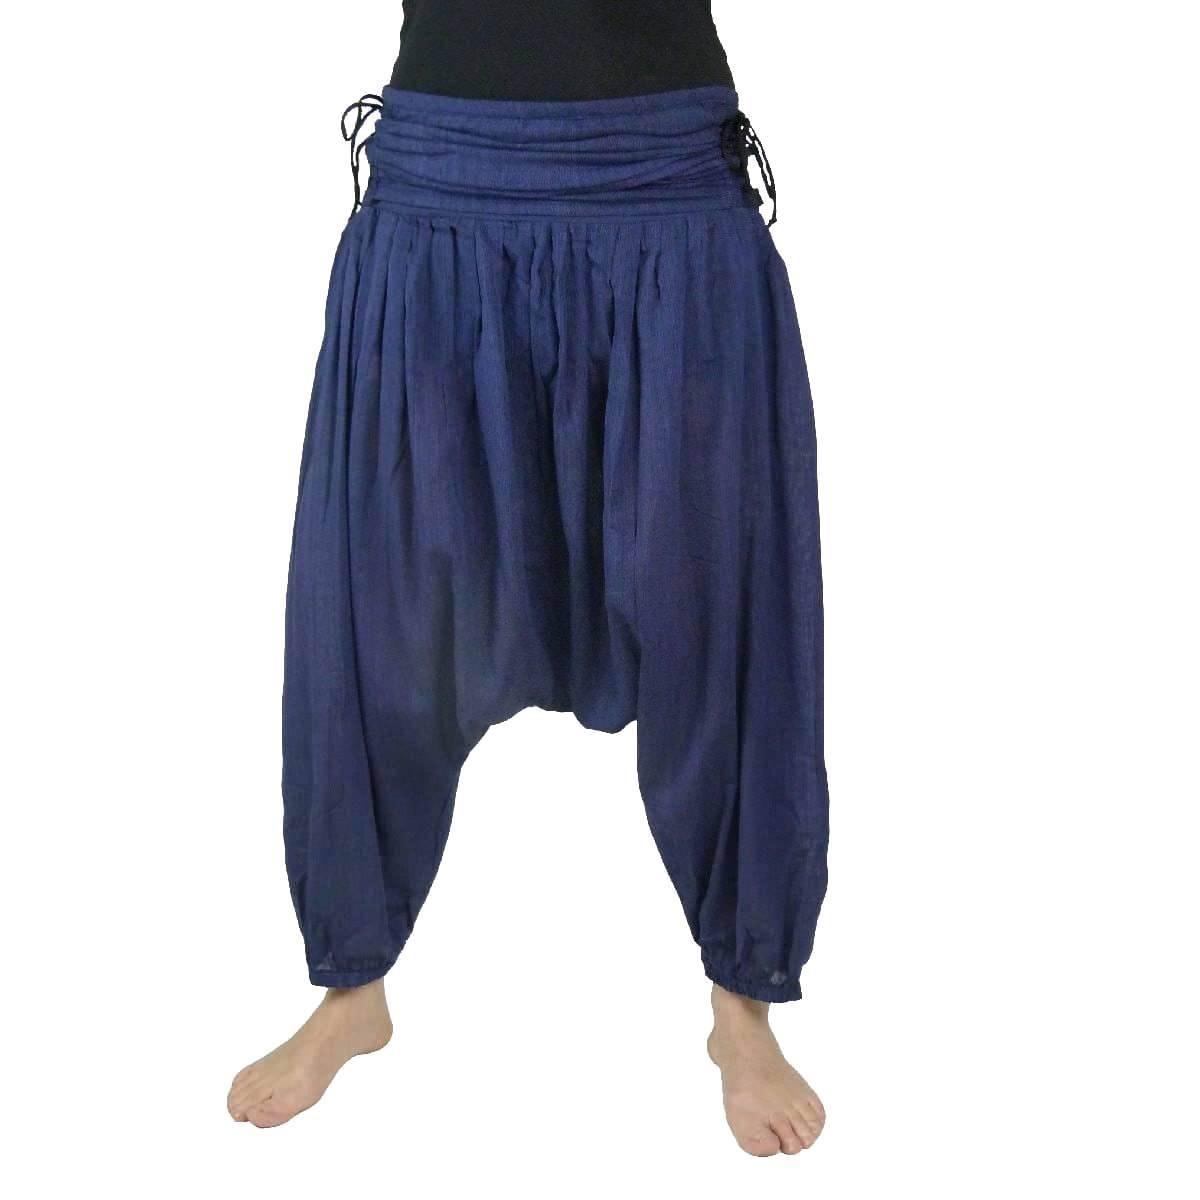 Goa Aladino Sarouel Yoga A Palloncino Harem Pantaloni qxUZw1XOq